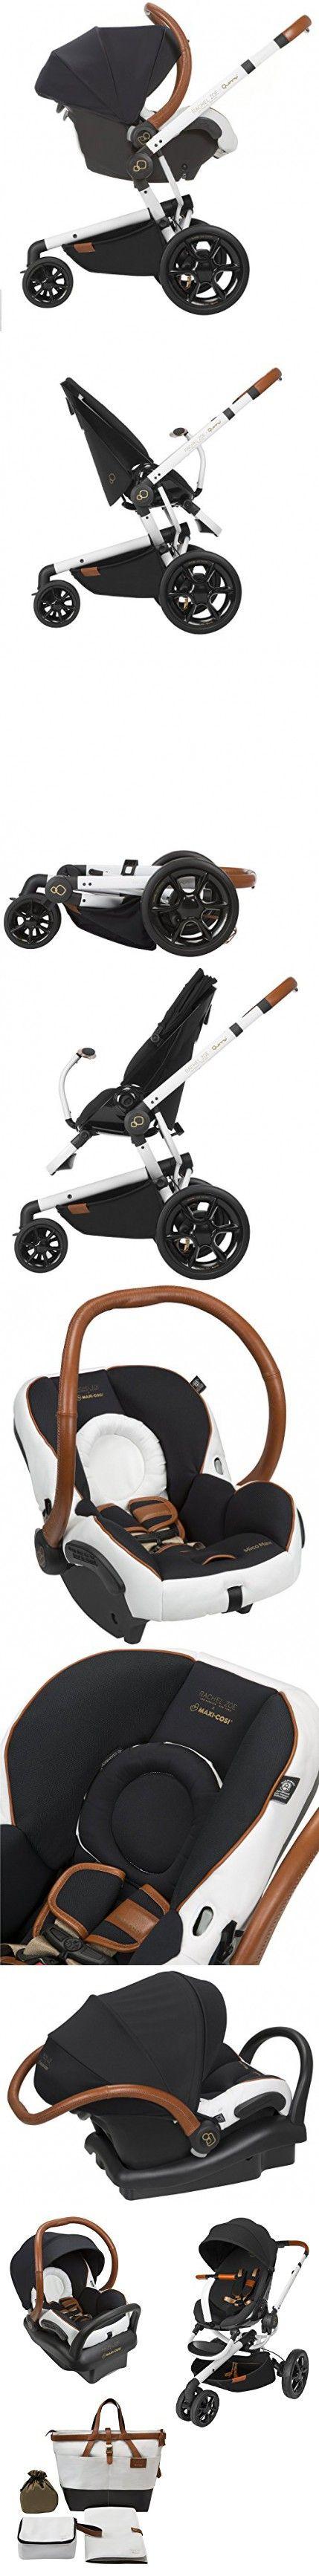 Best Designer Kinderwagen Longboard Quinny Contemporary - Home ...